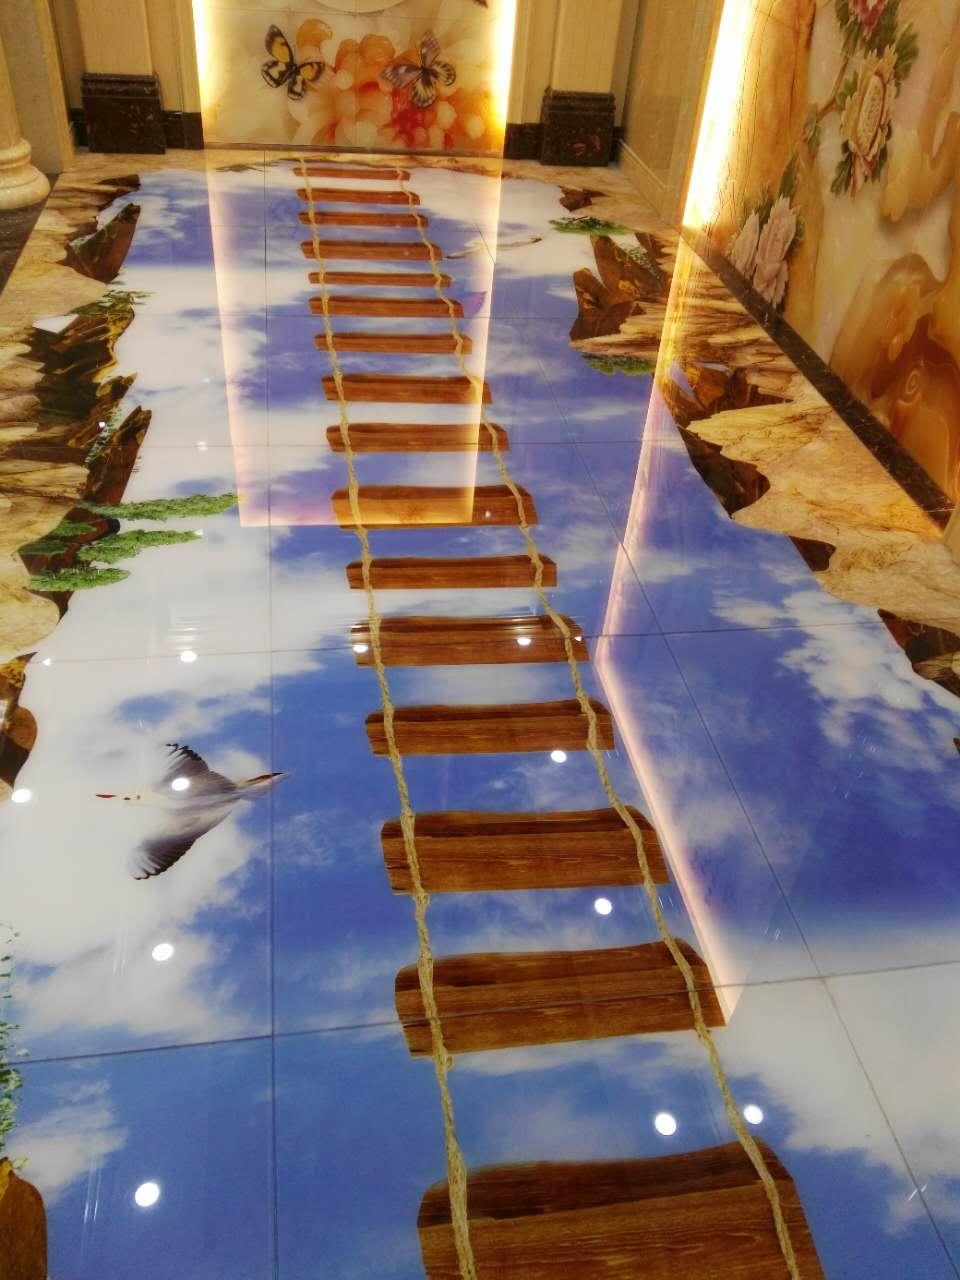 3D地板|3D地板公司专业|3D地板图片效果|3D地板装修